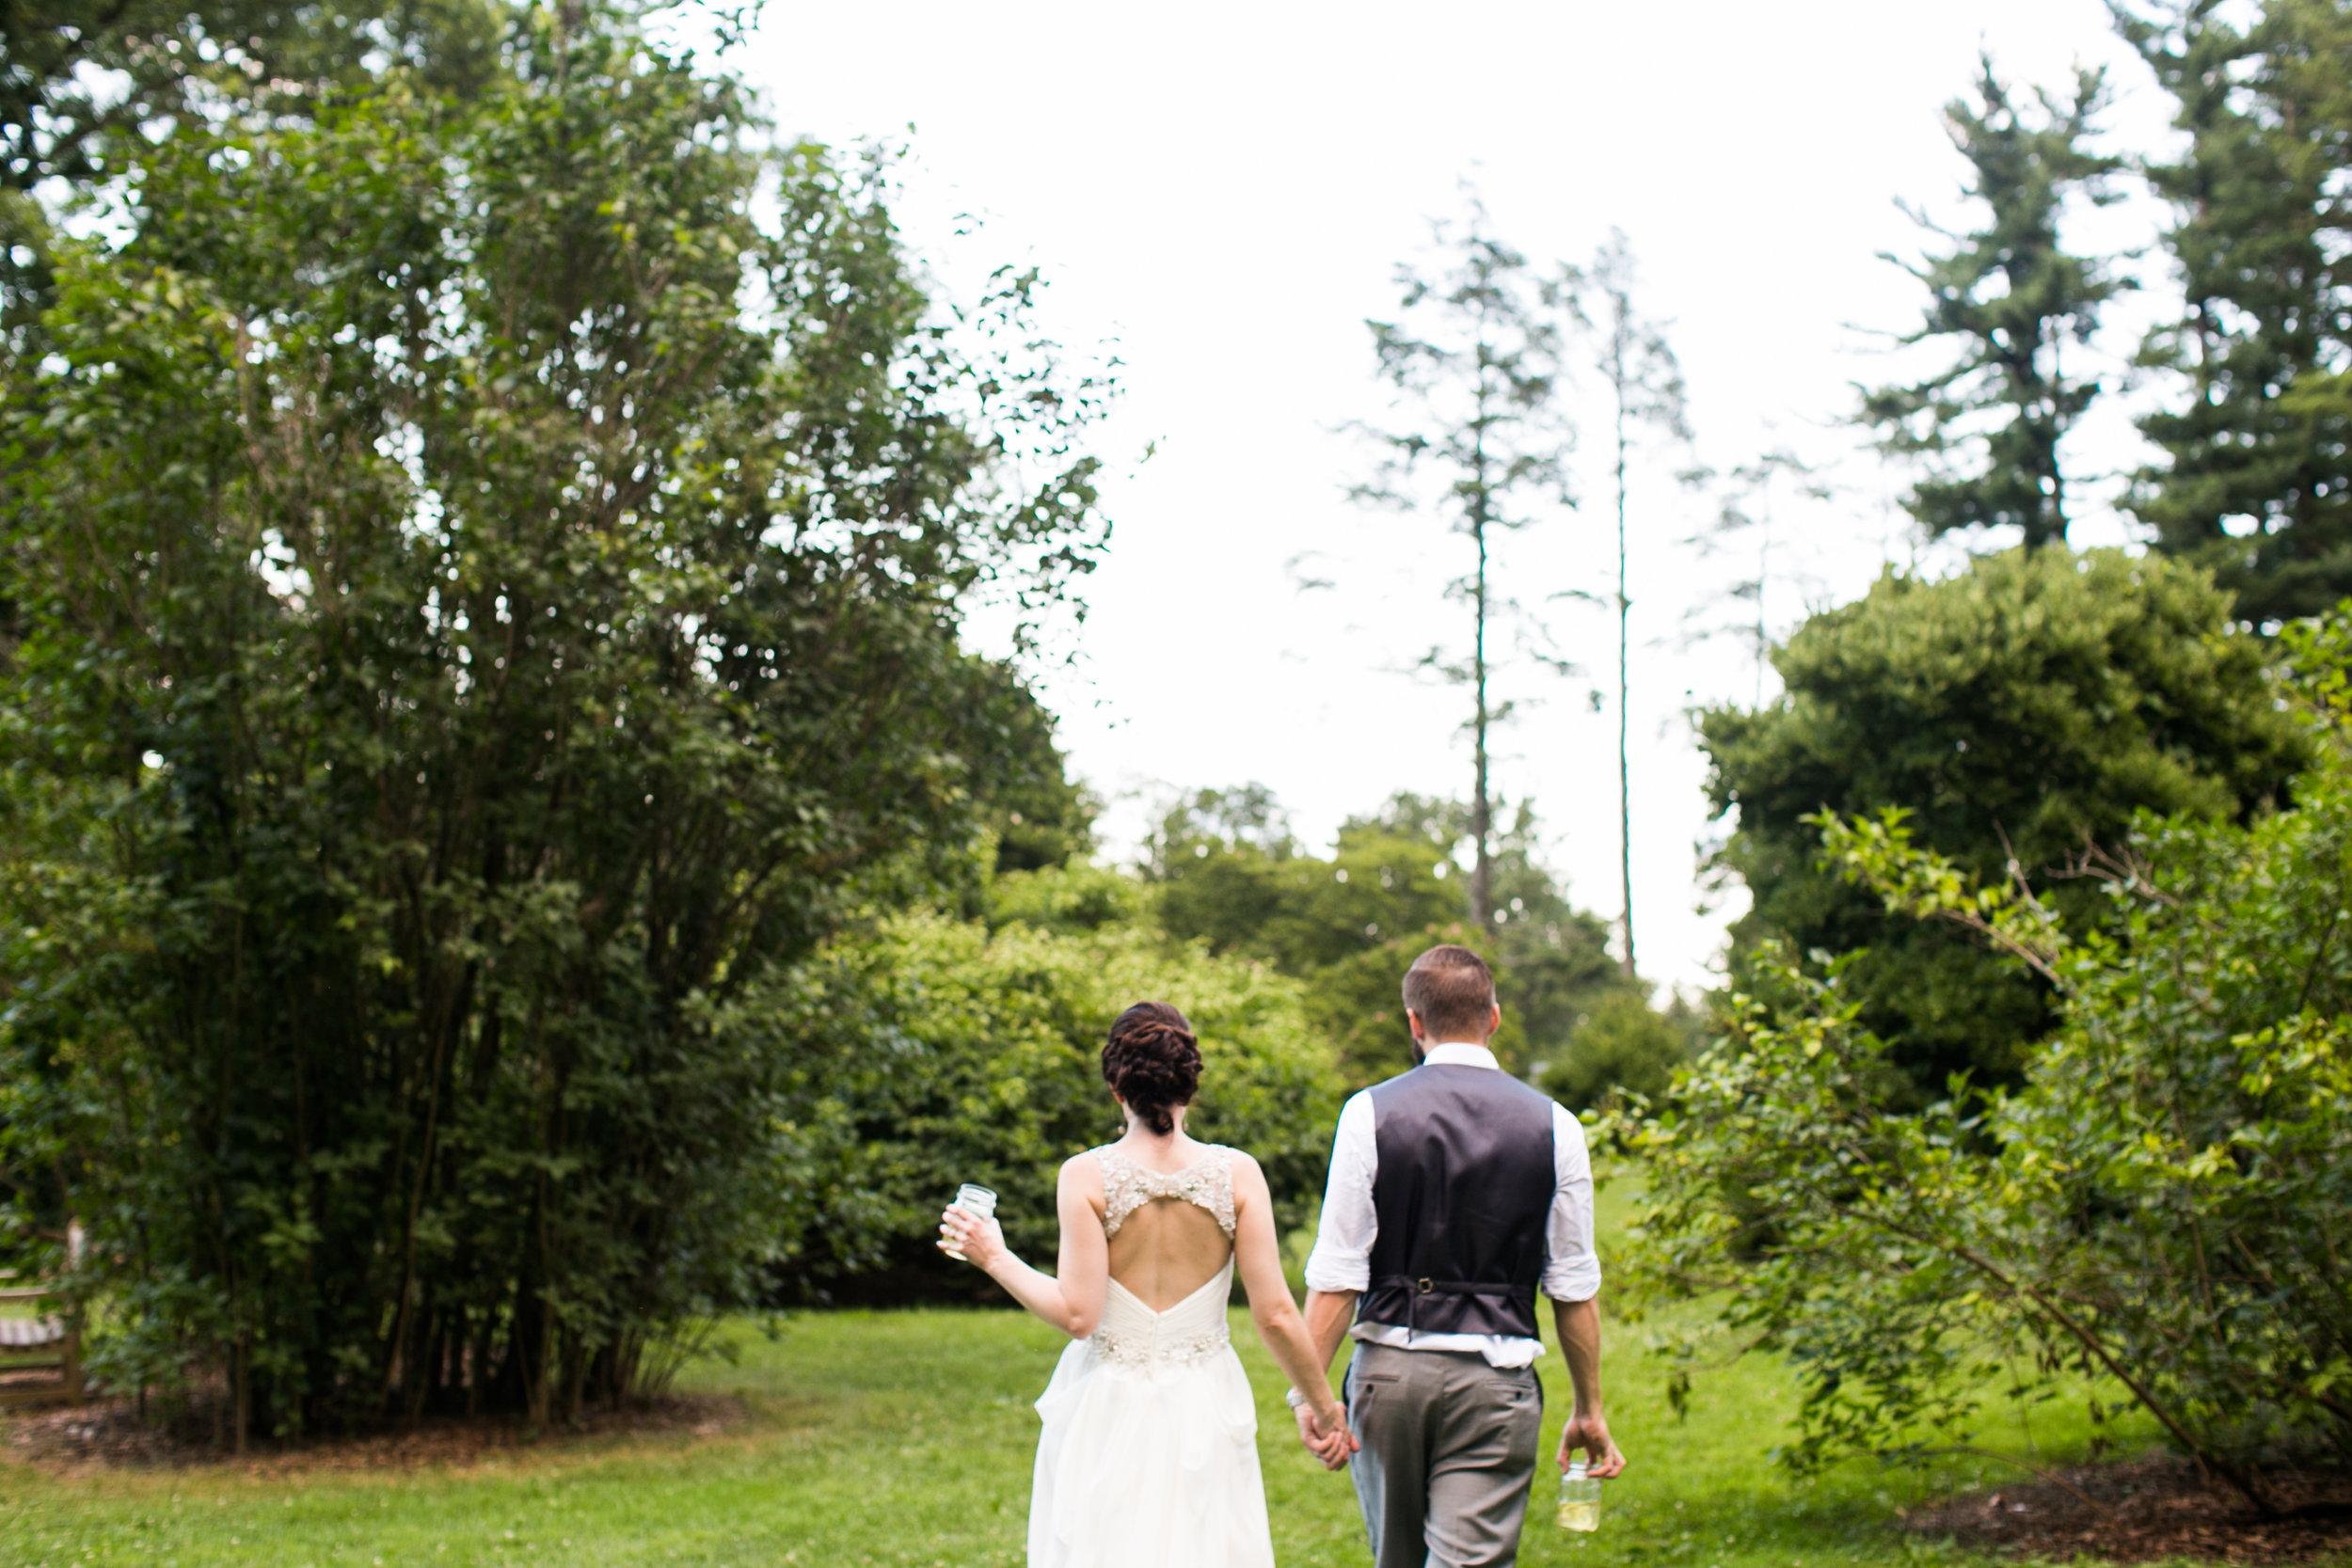 TYLER ARBORETUM WEDDING PHOTOGRAPHY LOVESTRUCK PICTURES-072.jpg